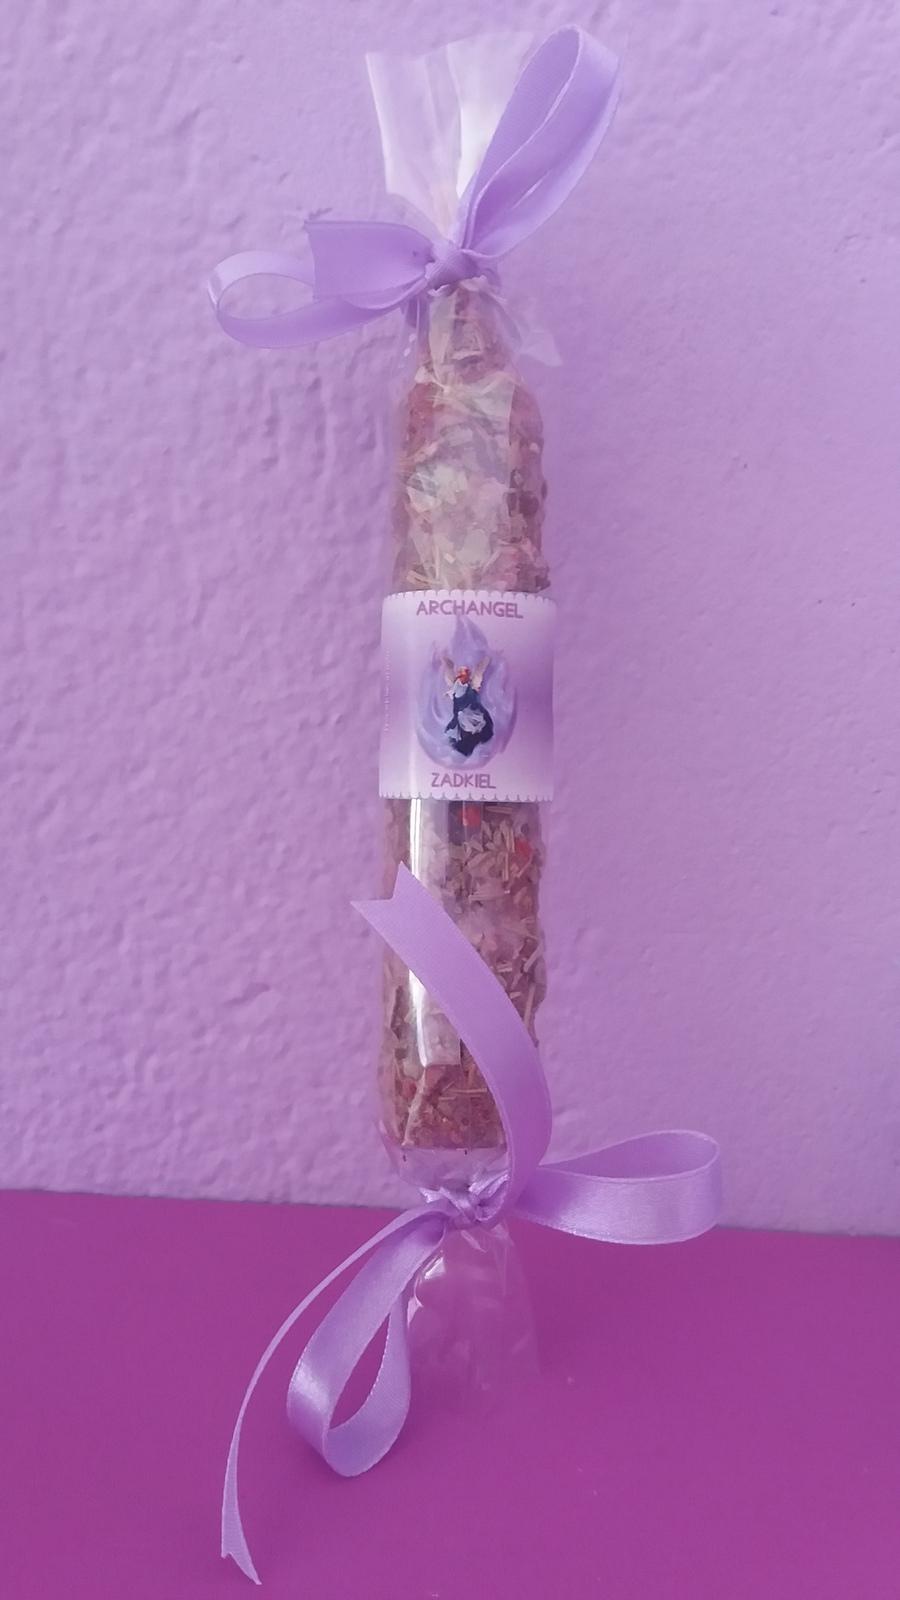 Archangel Zadkiel candle. For joy, love, forgiveness, freedom and mercy  - $16.99